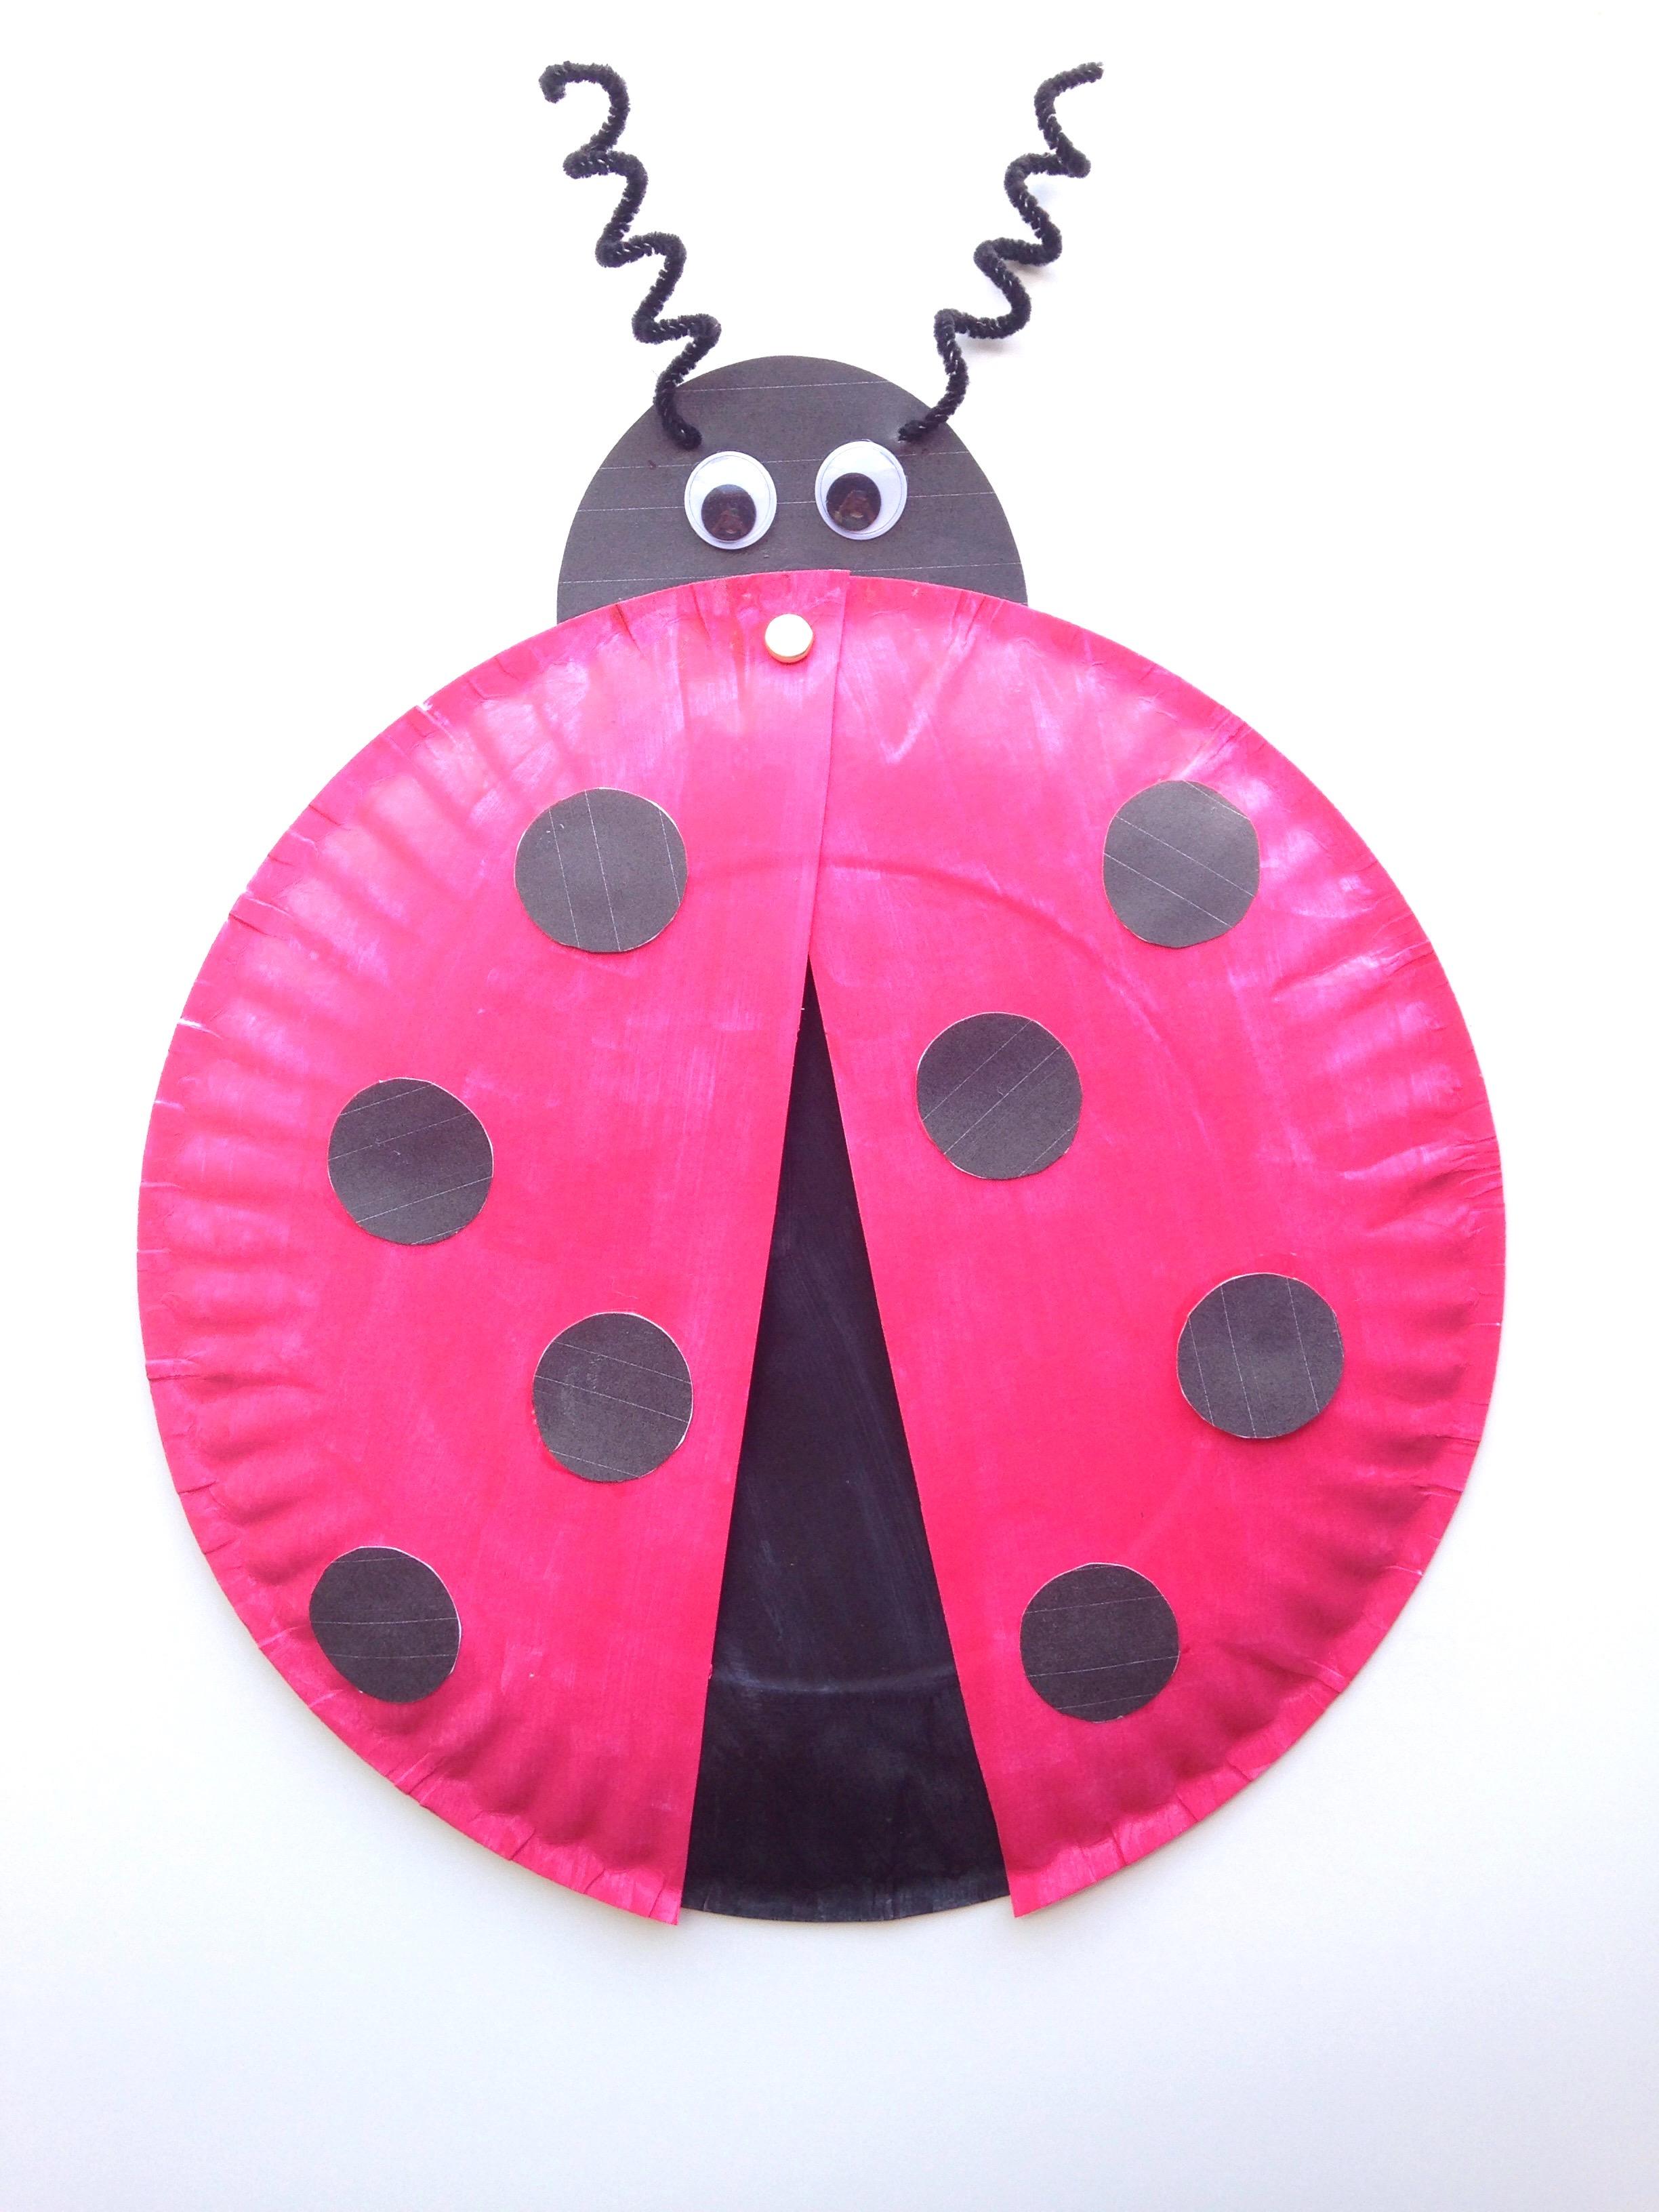 Ladybug Paper Plate Craft For Kids Free Printable